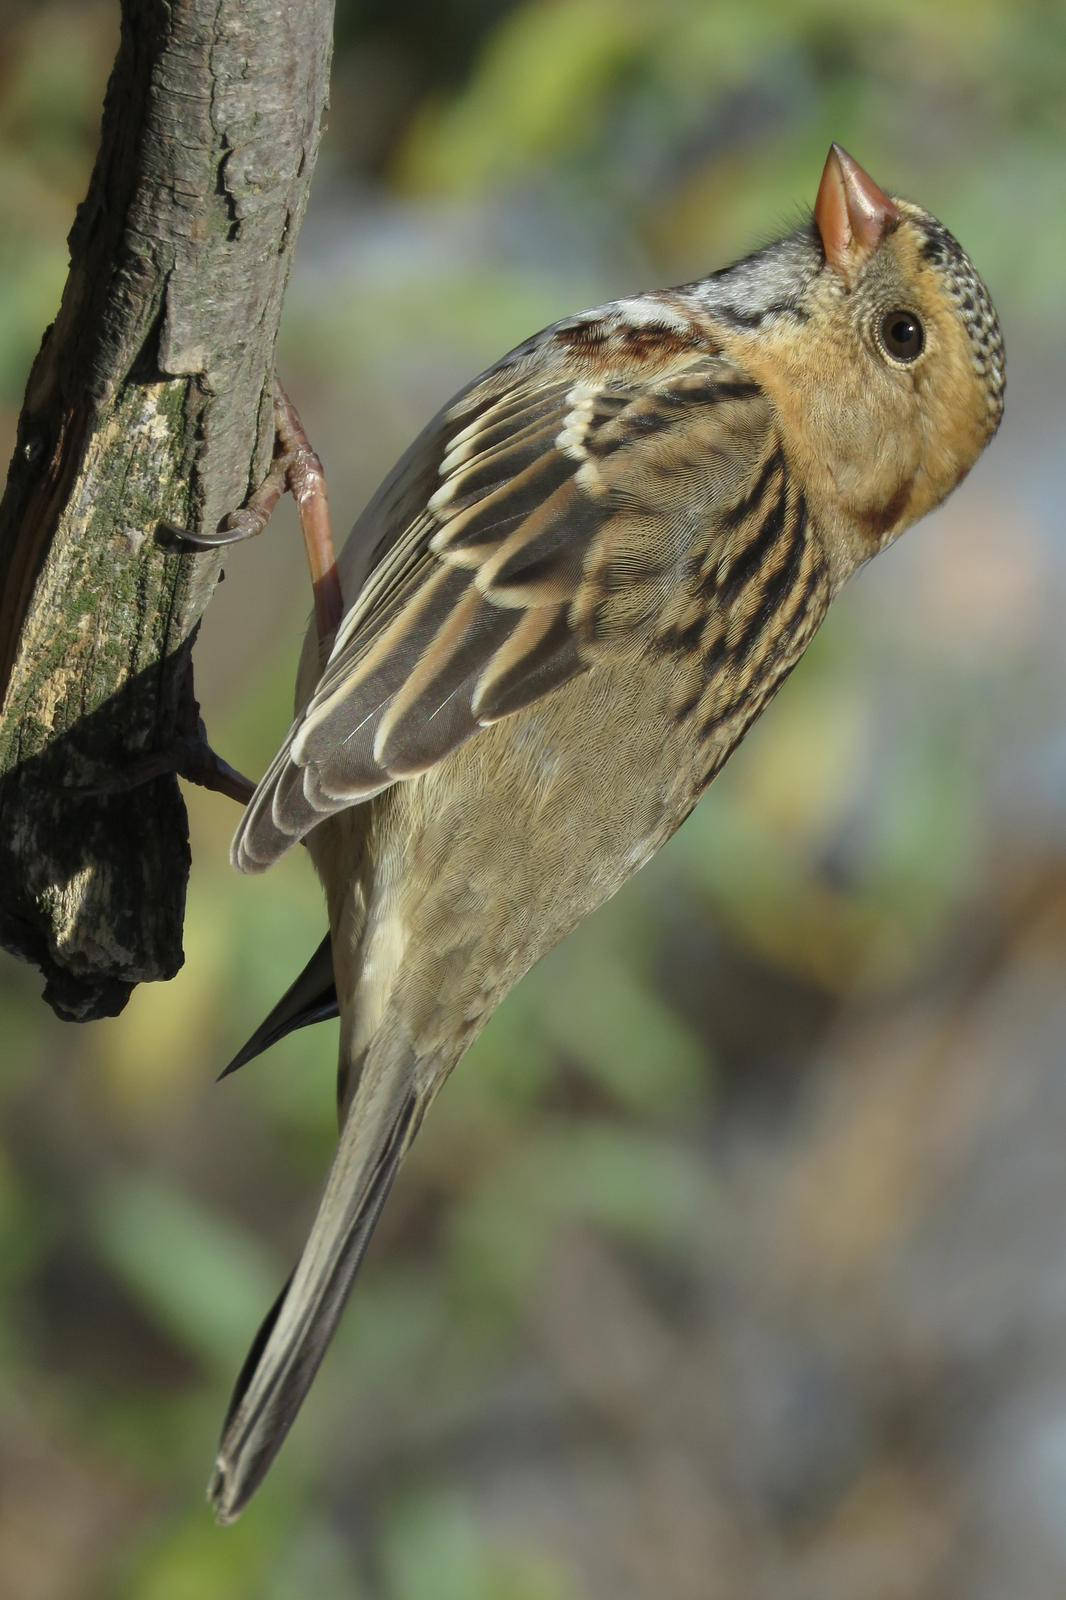 Harris's Sparrow Photo by Bob Neugebauer